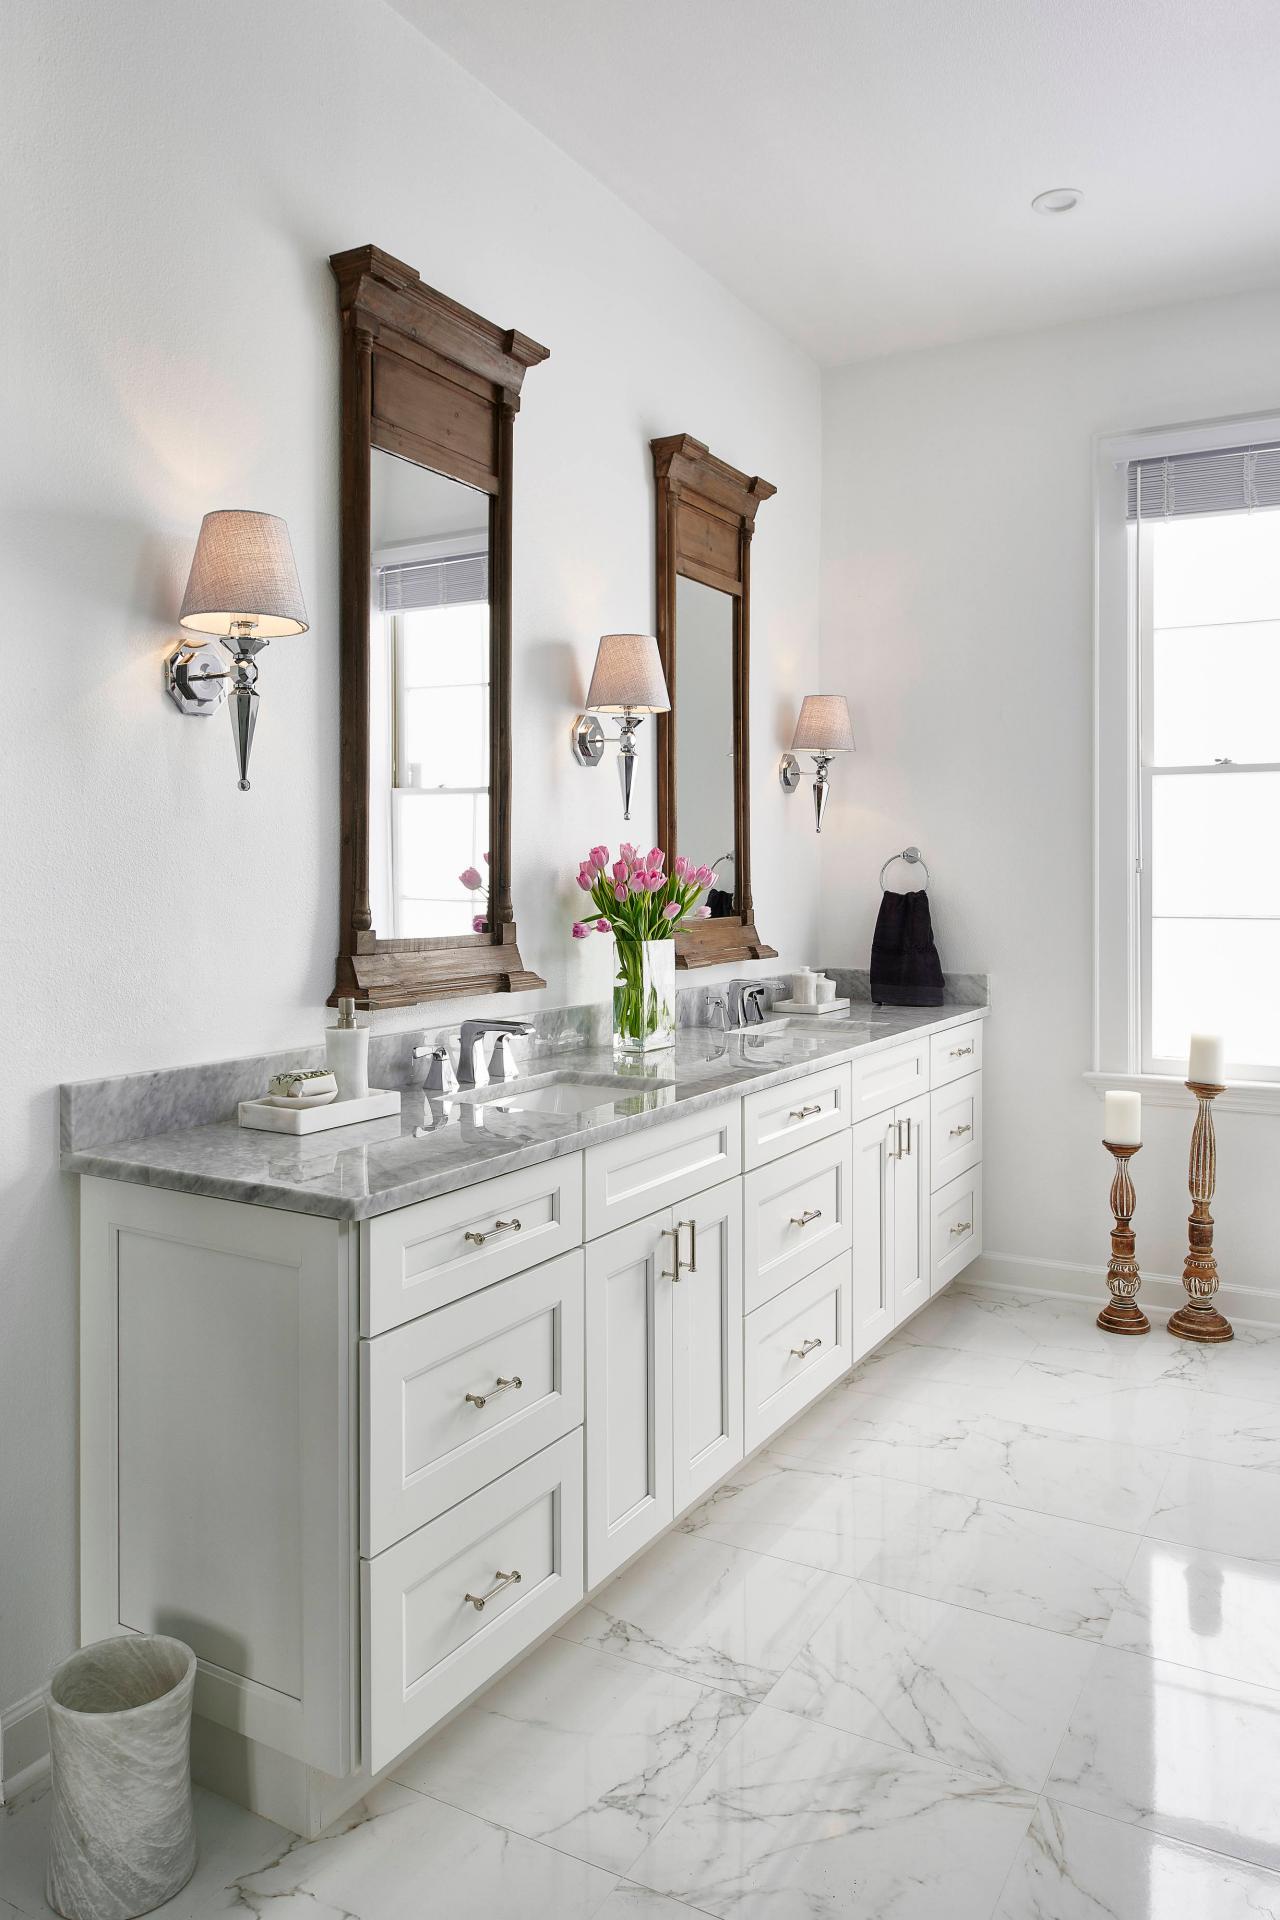 White Traditional Master Bath With Carrara Marble Countertop | HGTV